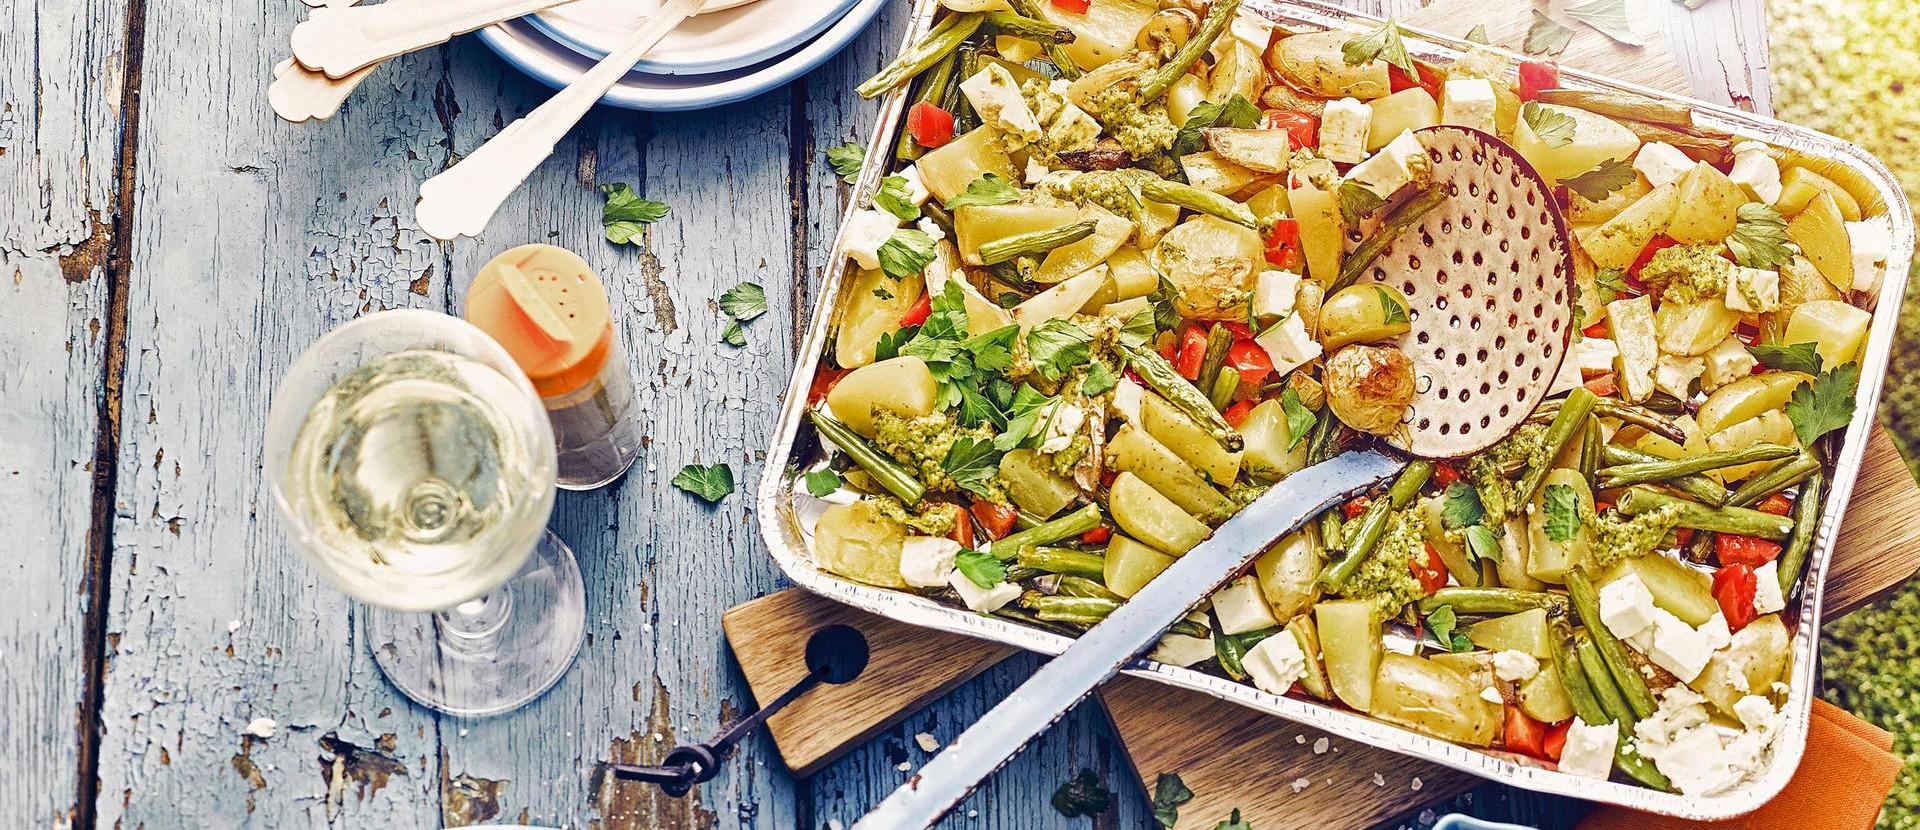 Grillen grillkartoffeln gruene bohnen feta weisswein